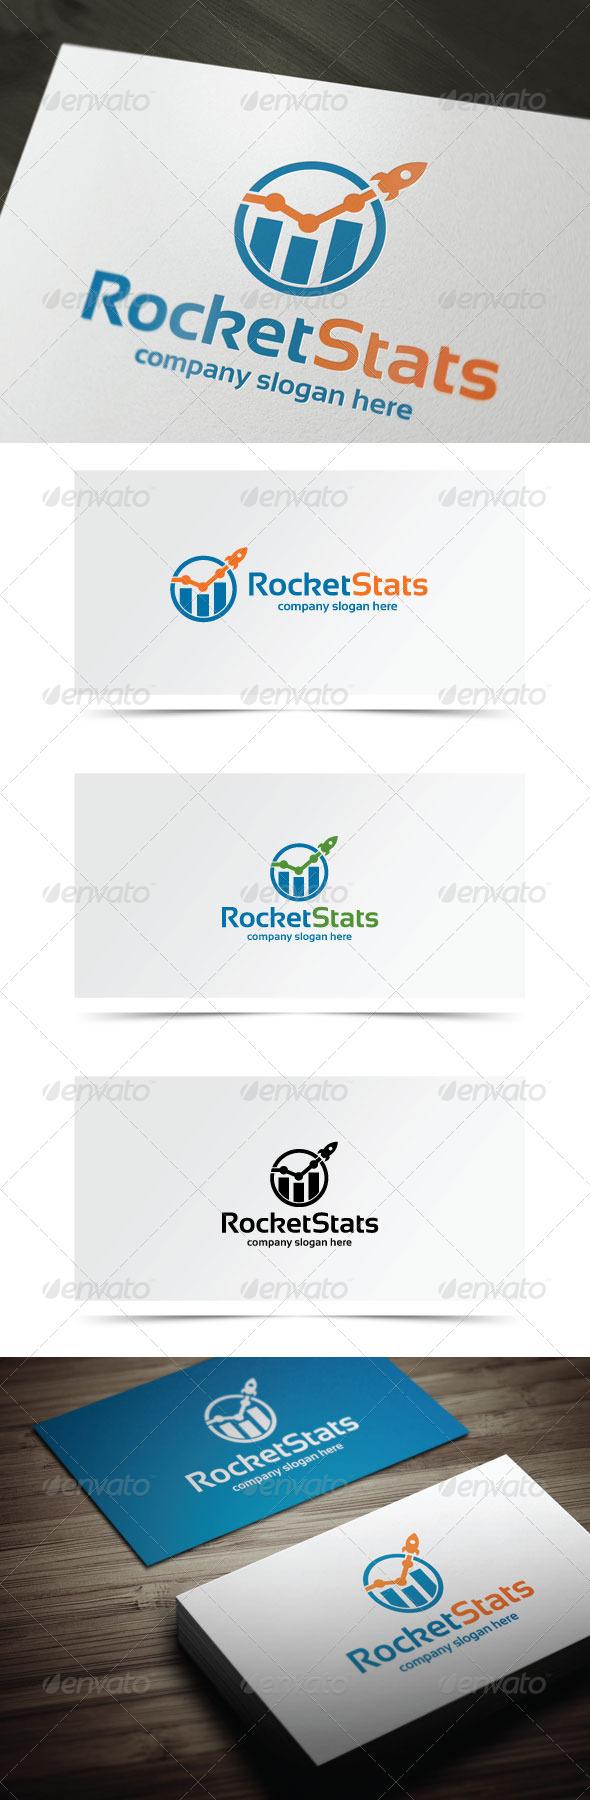 GraphicRiver Rocket Stats 7553926